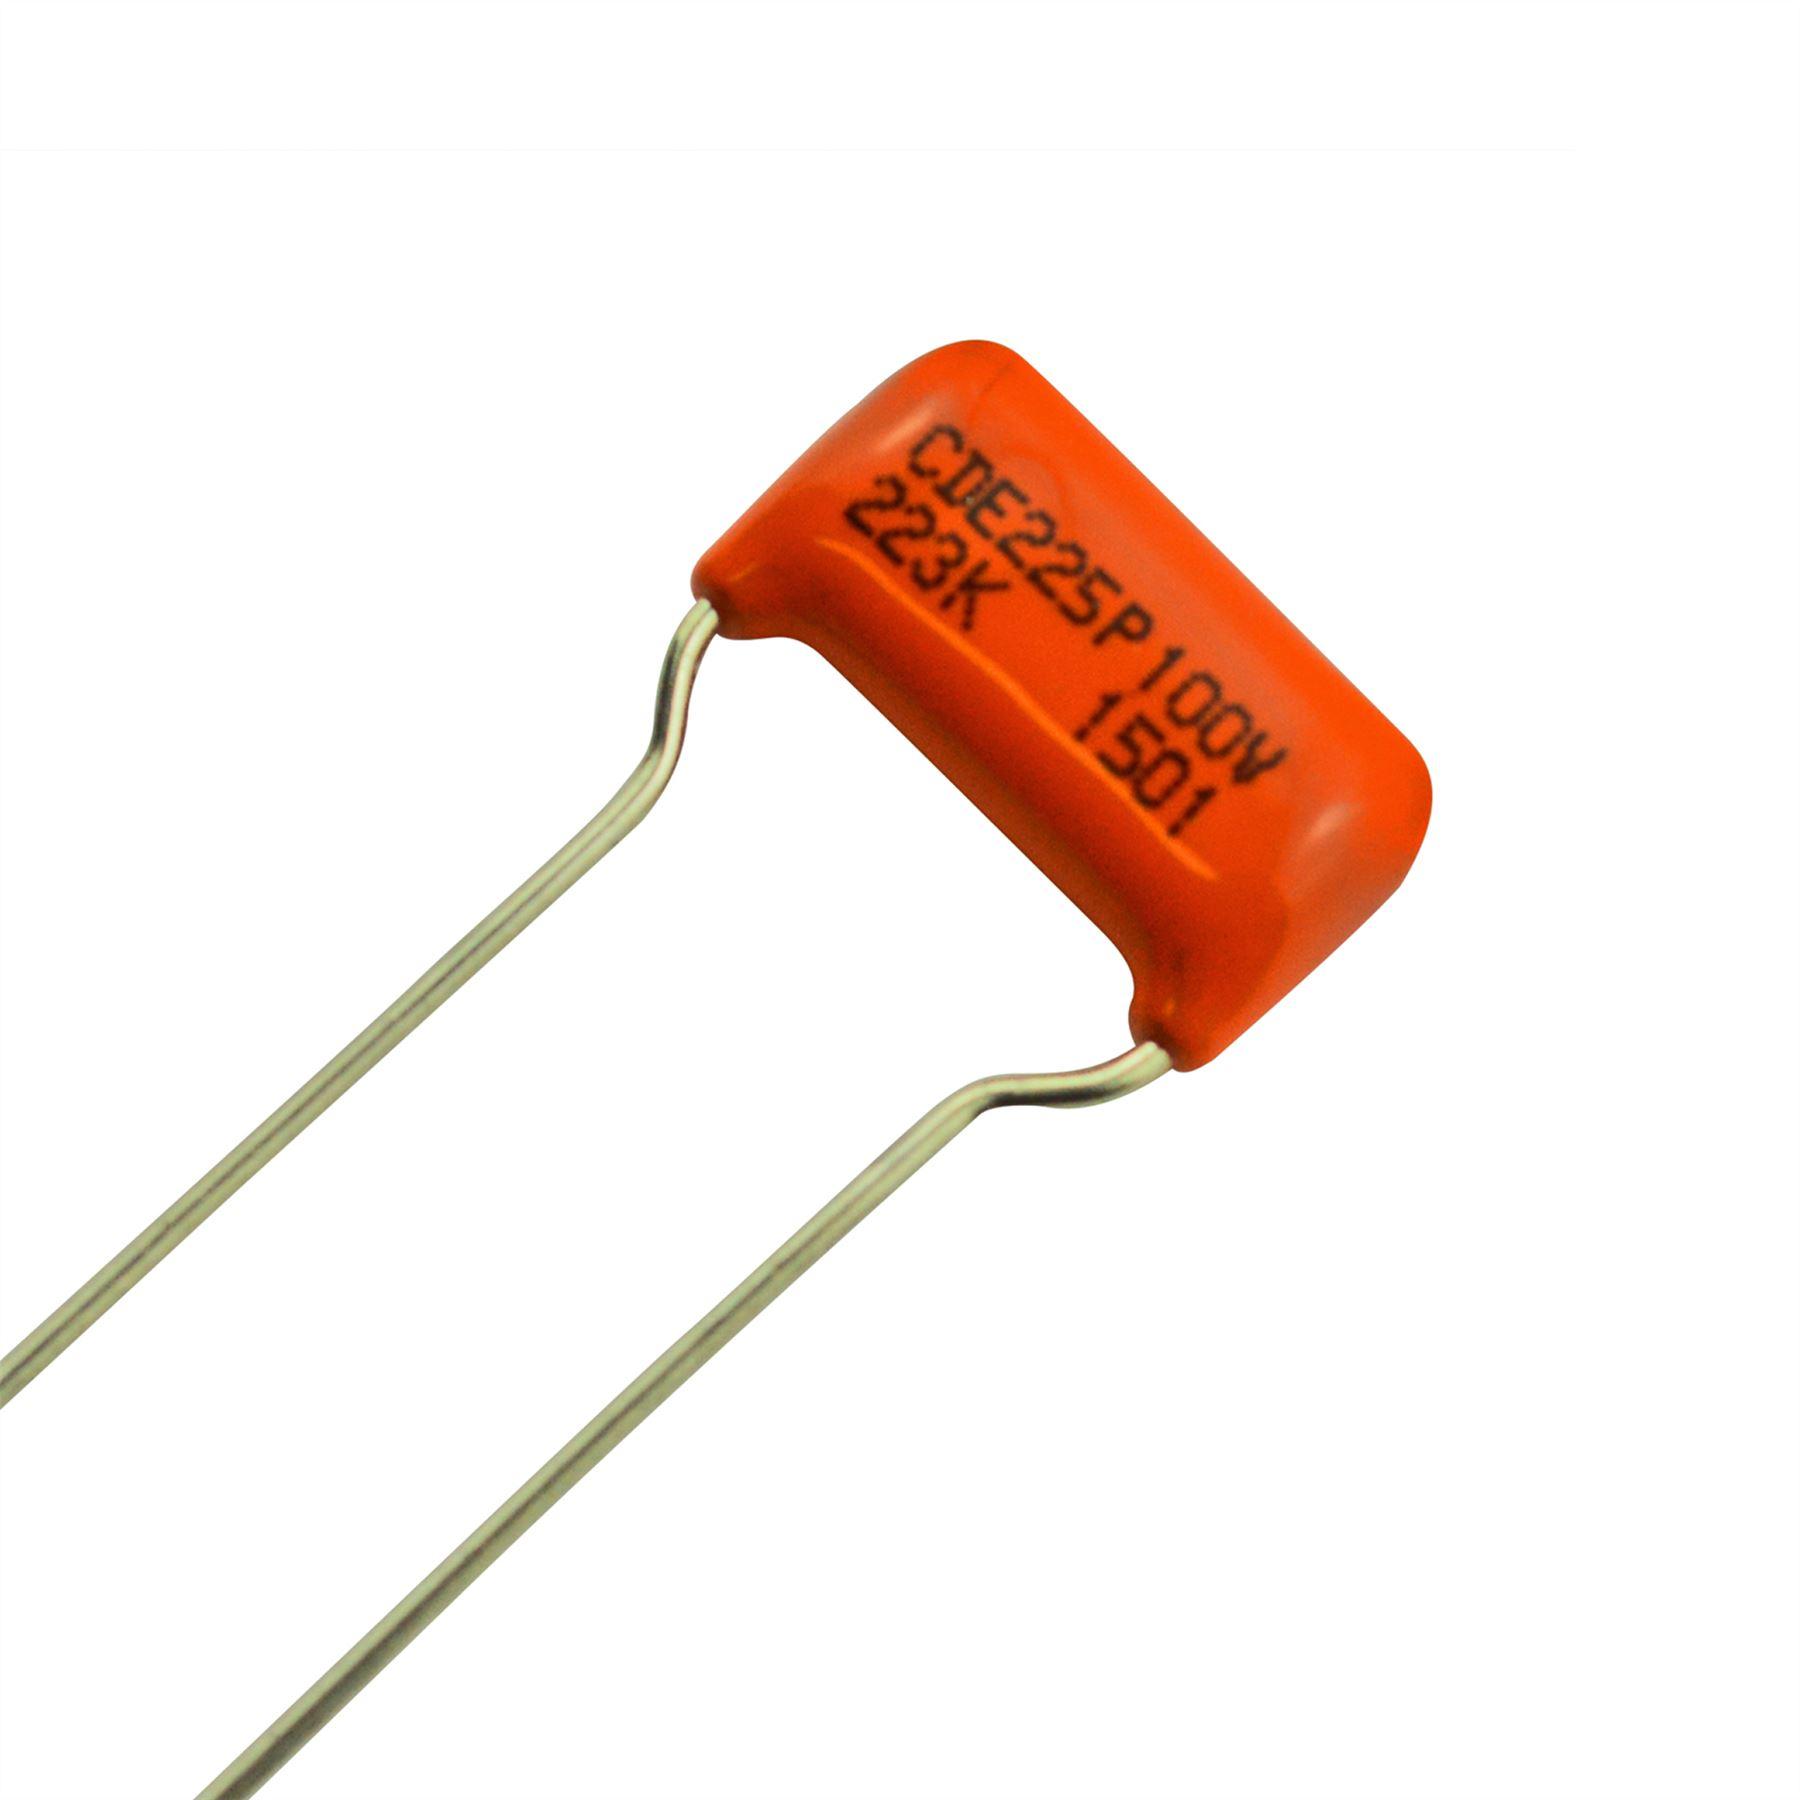 Sprague Orange Drop 022 Capacitor For Electric Guitars With Humbucker Pickups